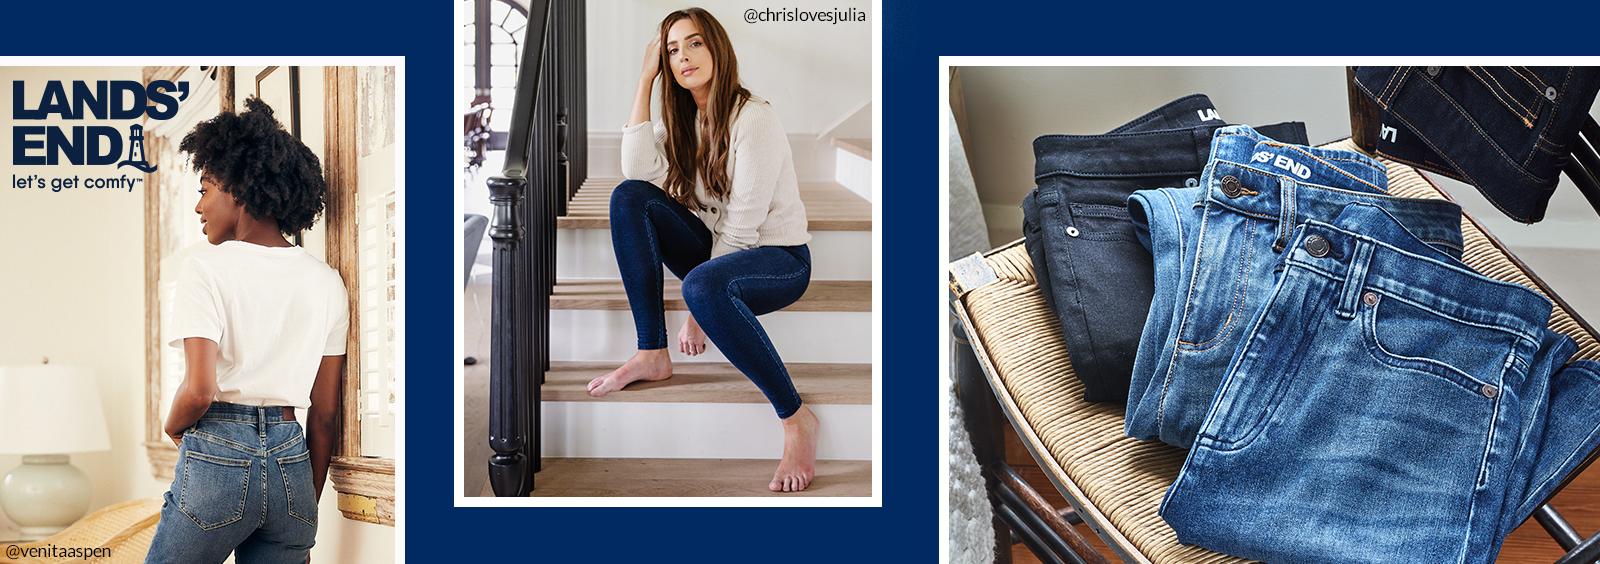 Best Women's Jeans for Back-to-School